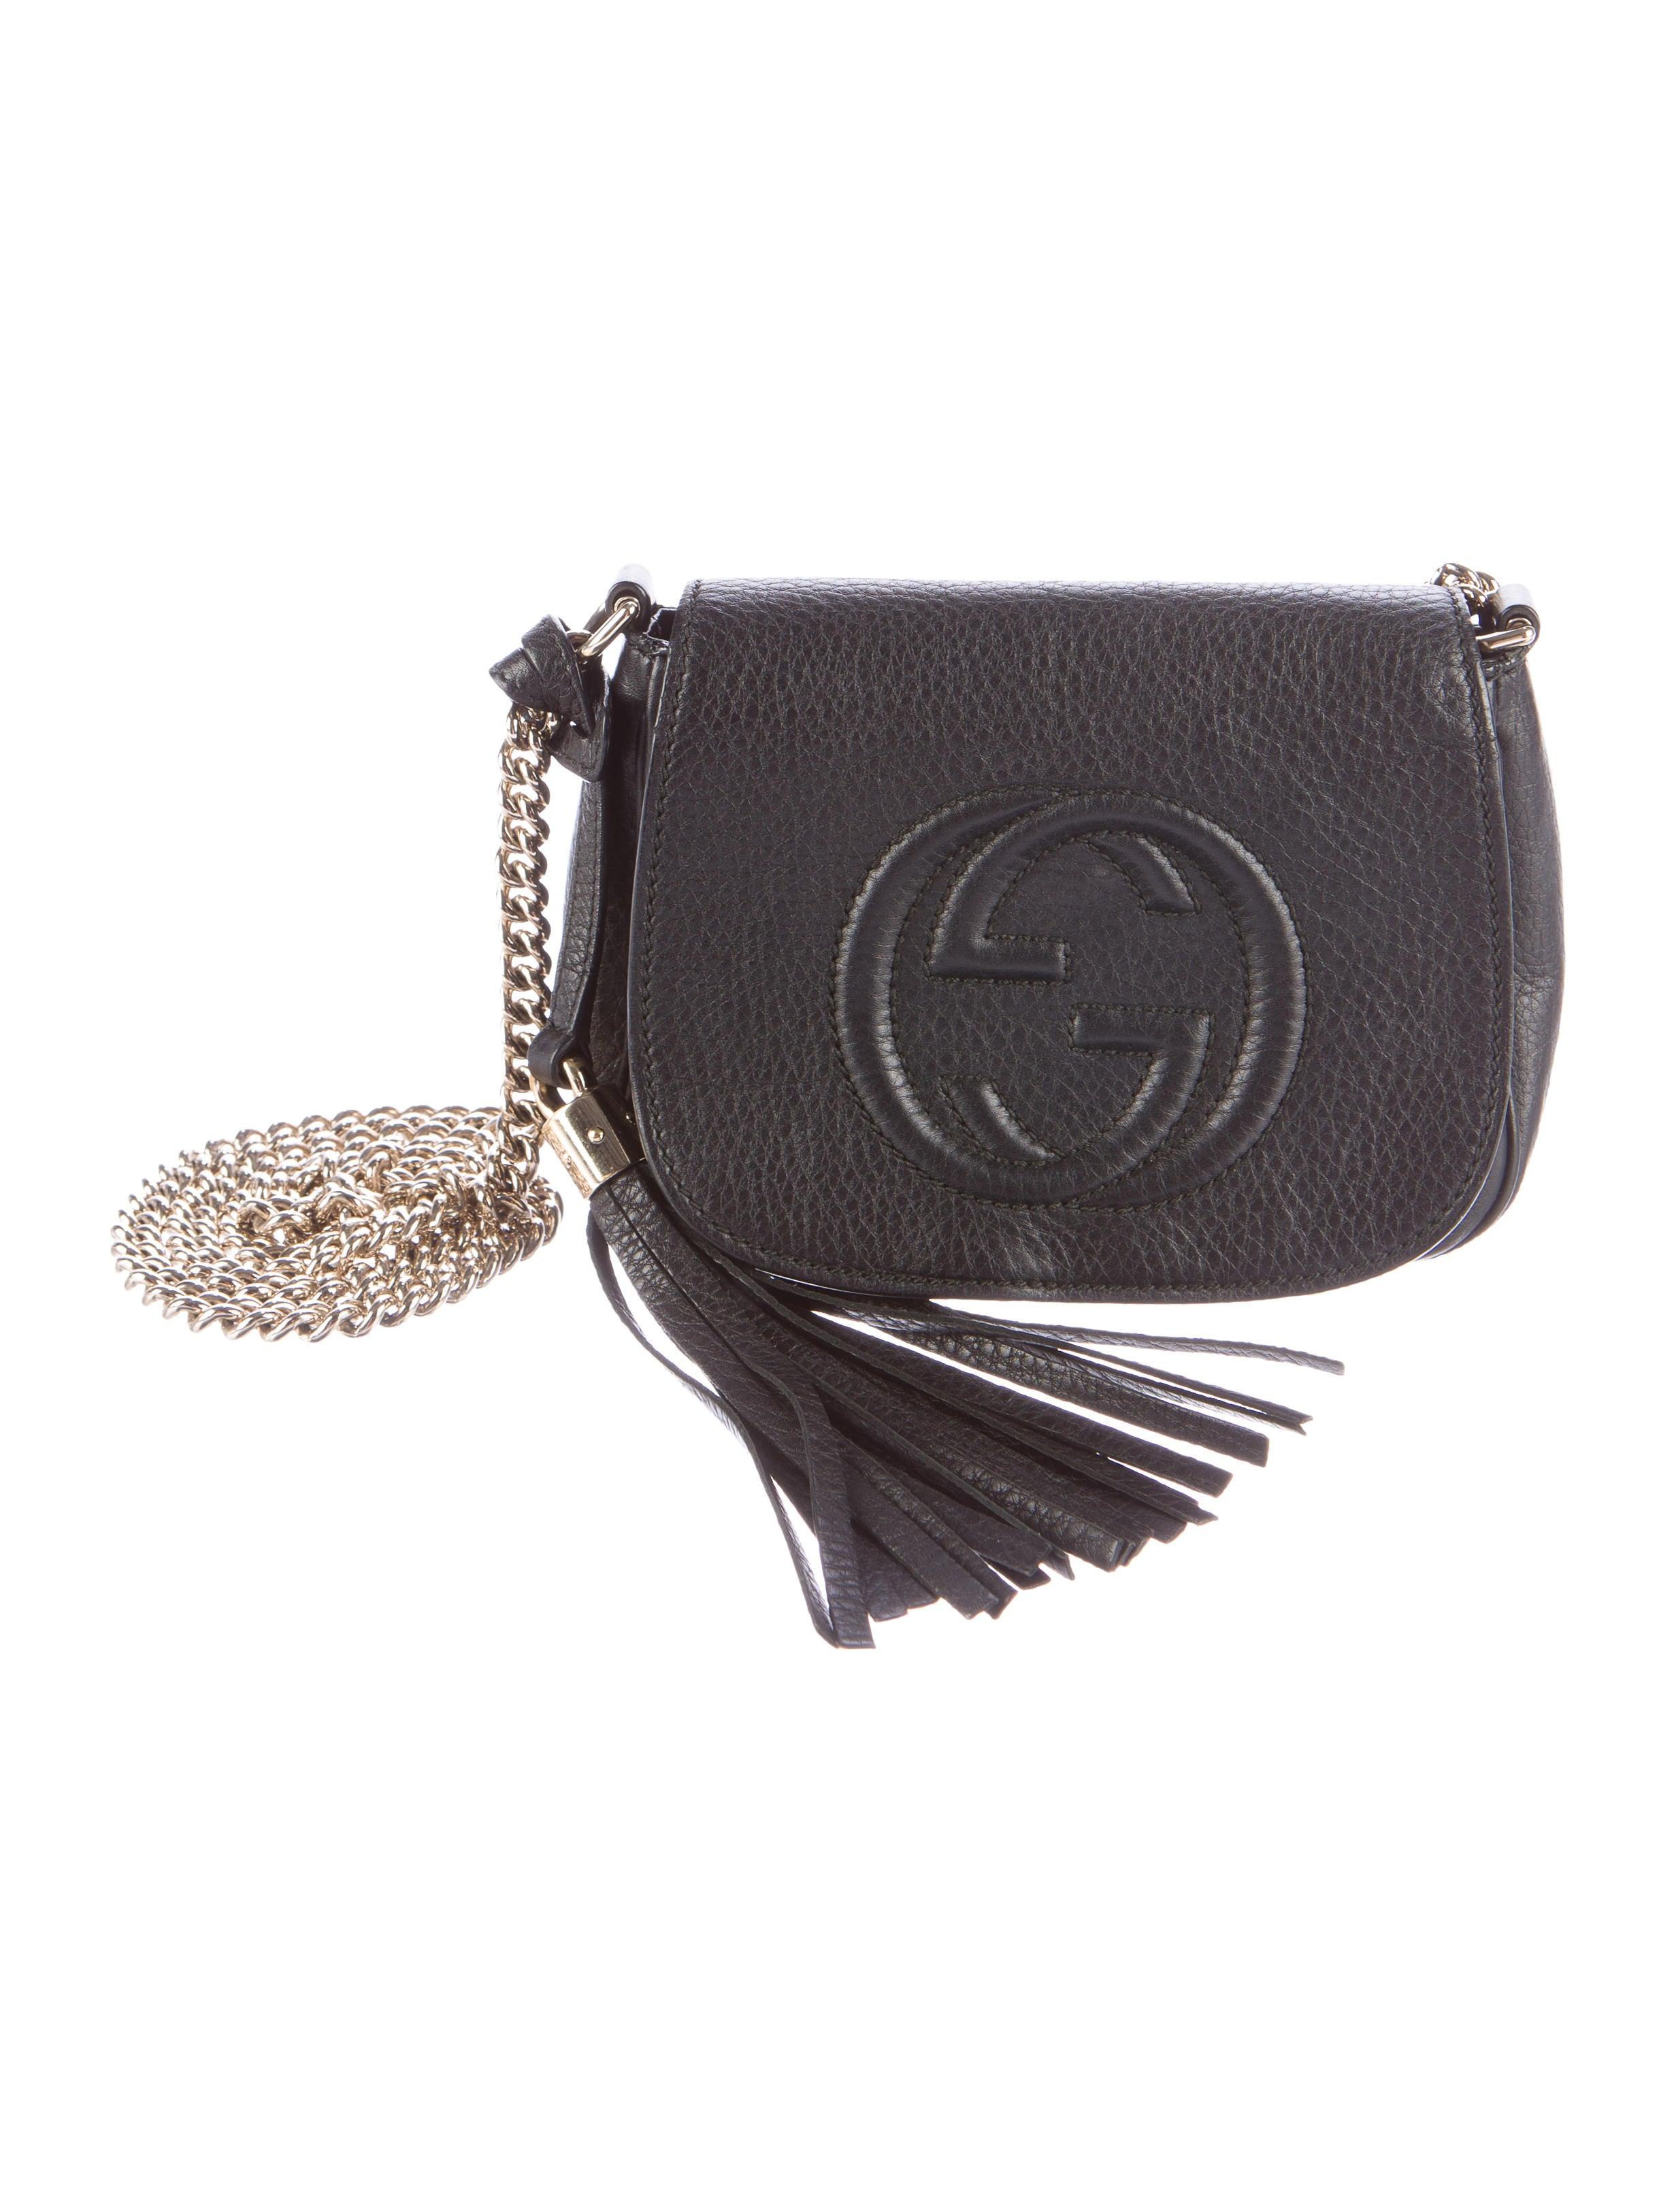 b62d2ed07846 Gucci Soho Chain Crossbody Bag - Handbags - GUC114924 | The RealReal